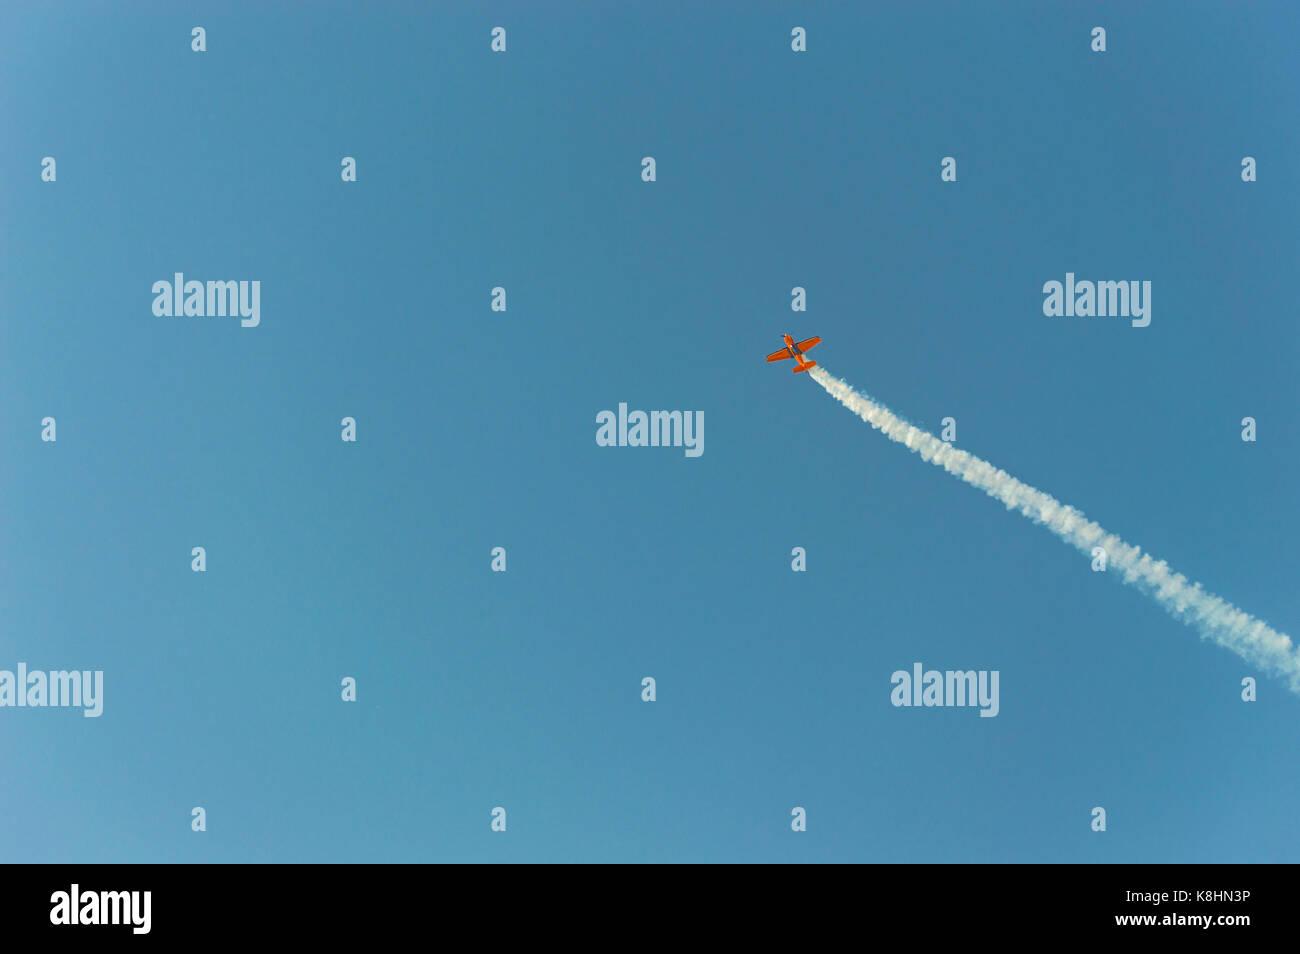 Aerobatic plane  leaving a white smoke trail in the bright blue sky. - Stock Image